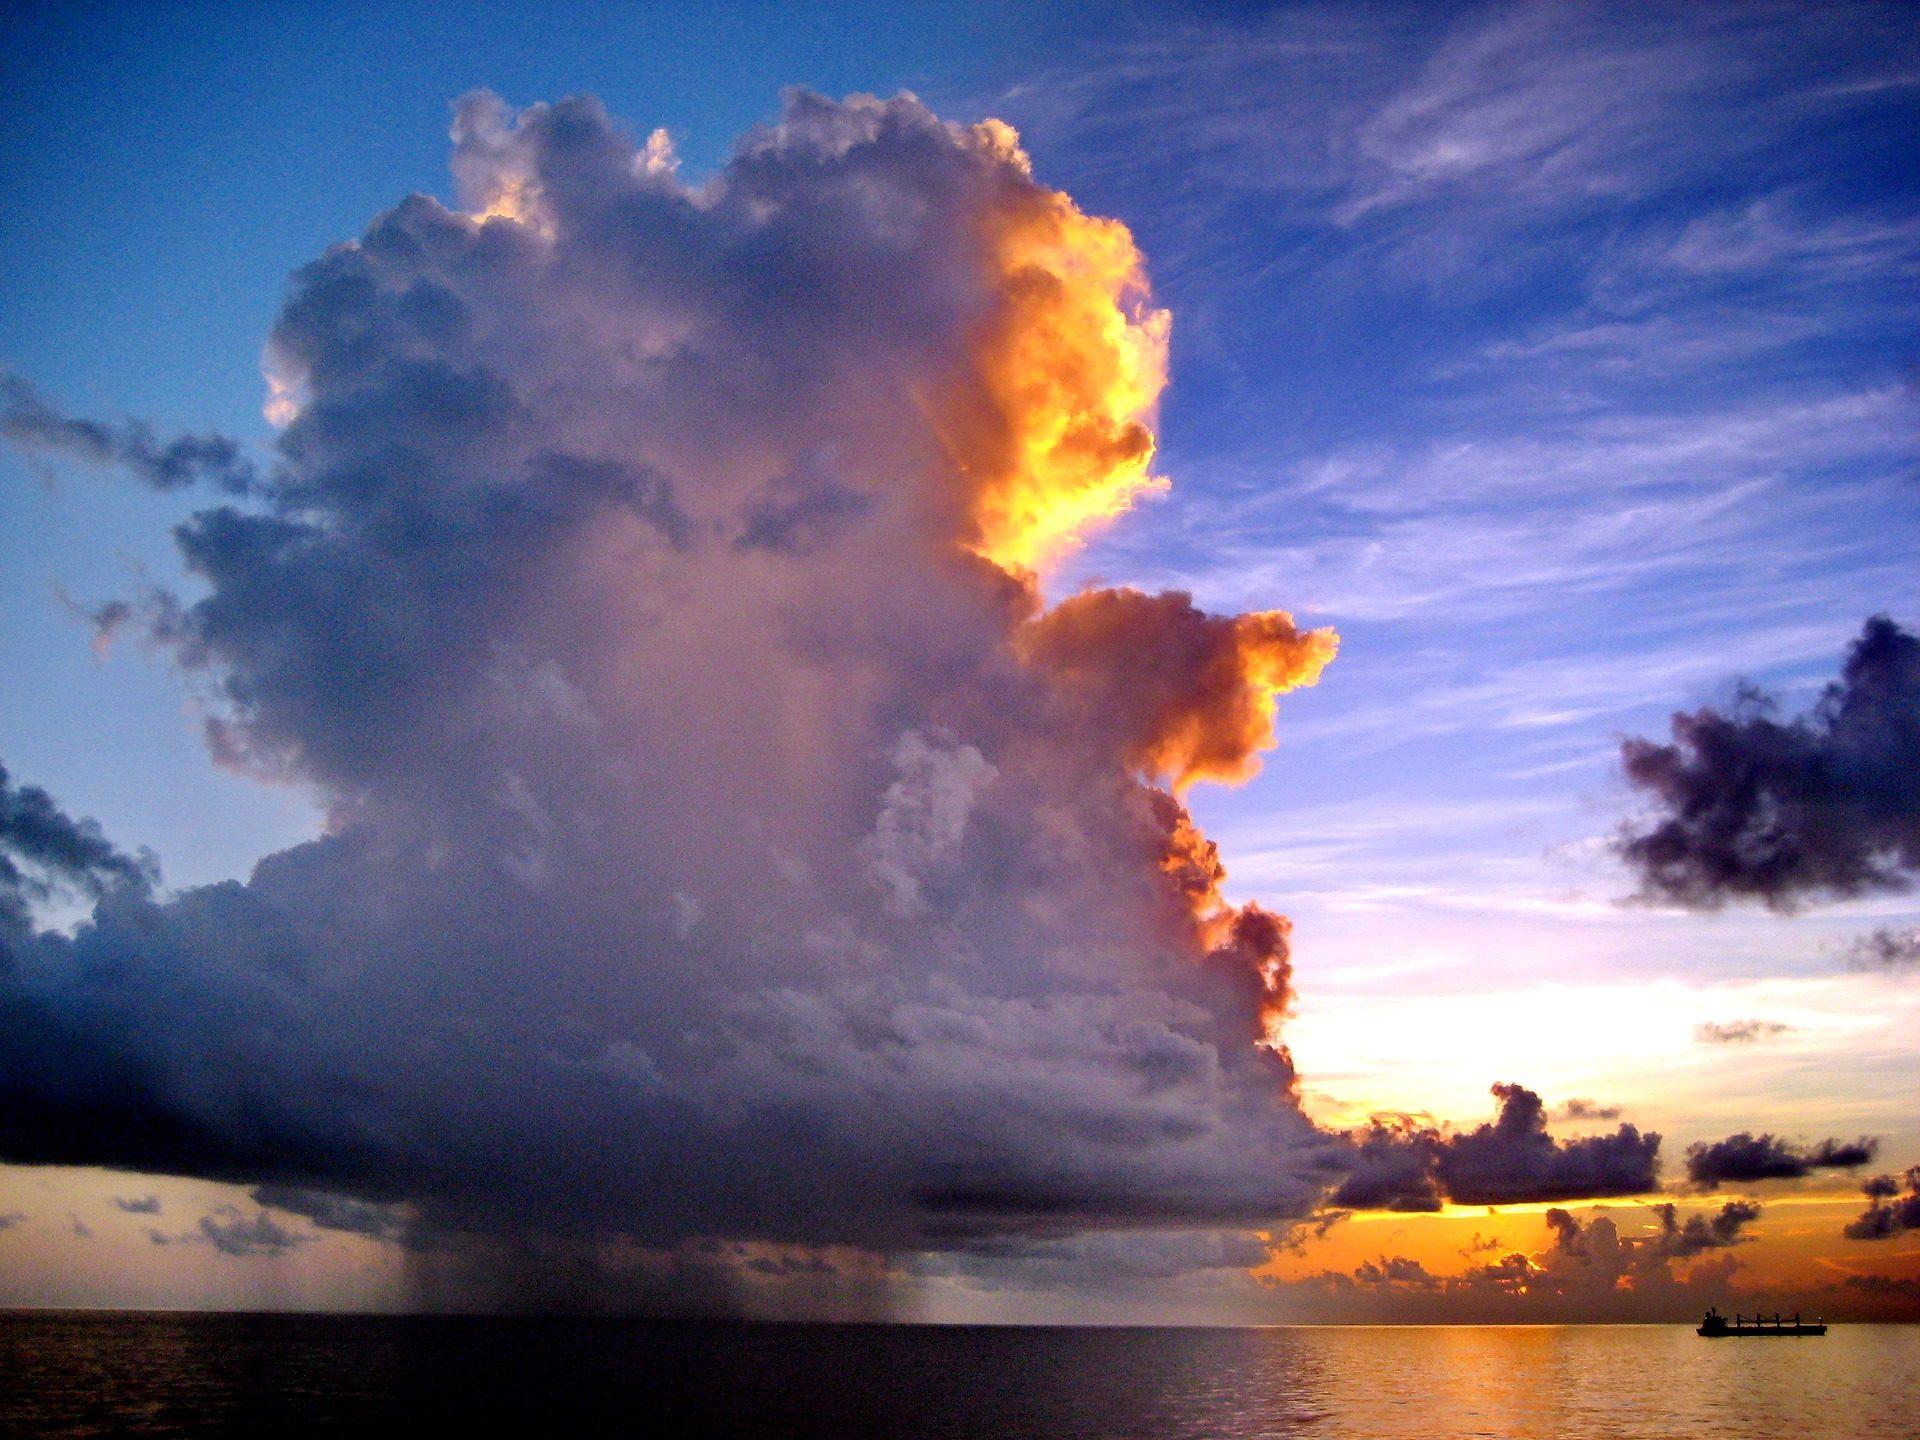 nuvem, cluster de, reflexão, Sol, Pôr do sol, Mar, barco - Papéis de parede HD - Professor-falken.com